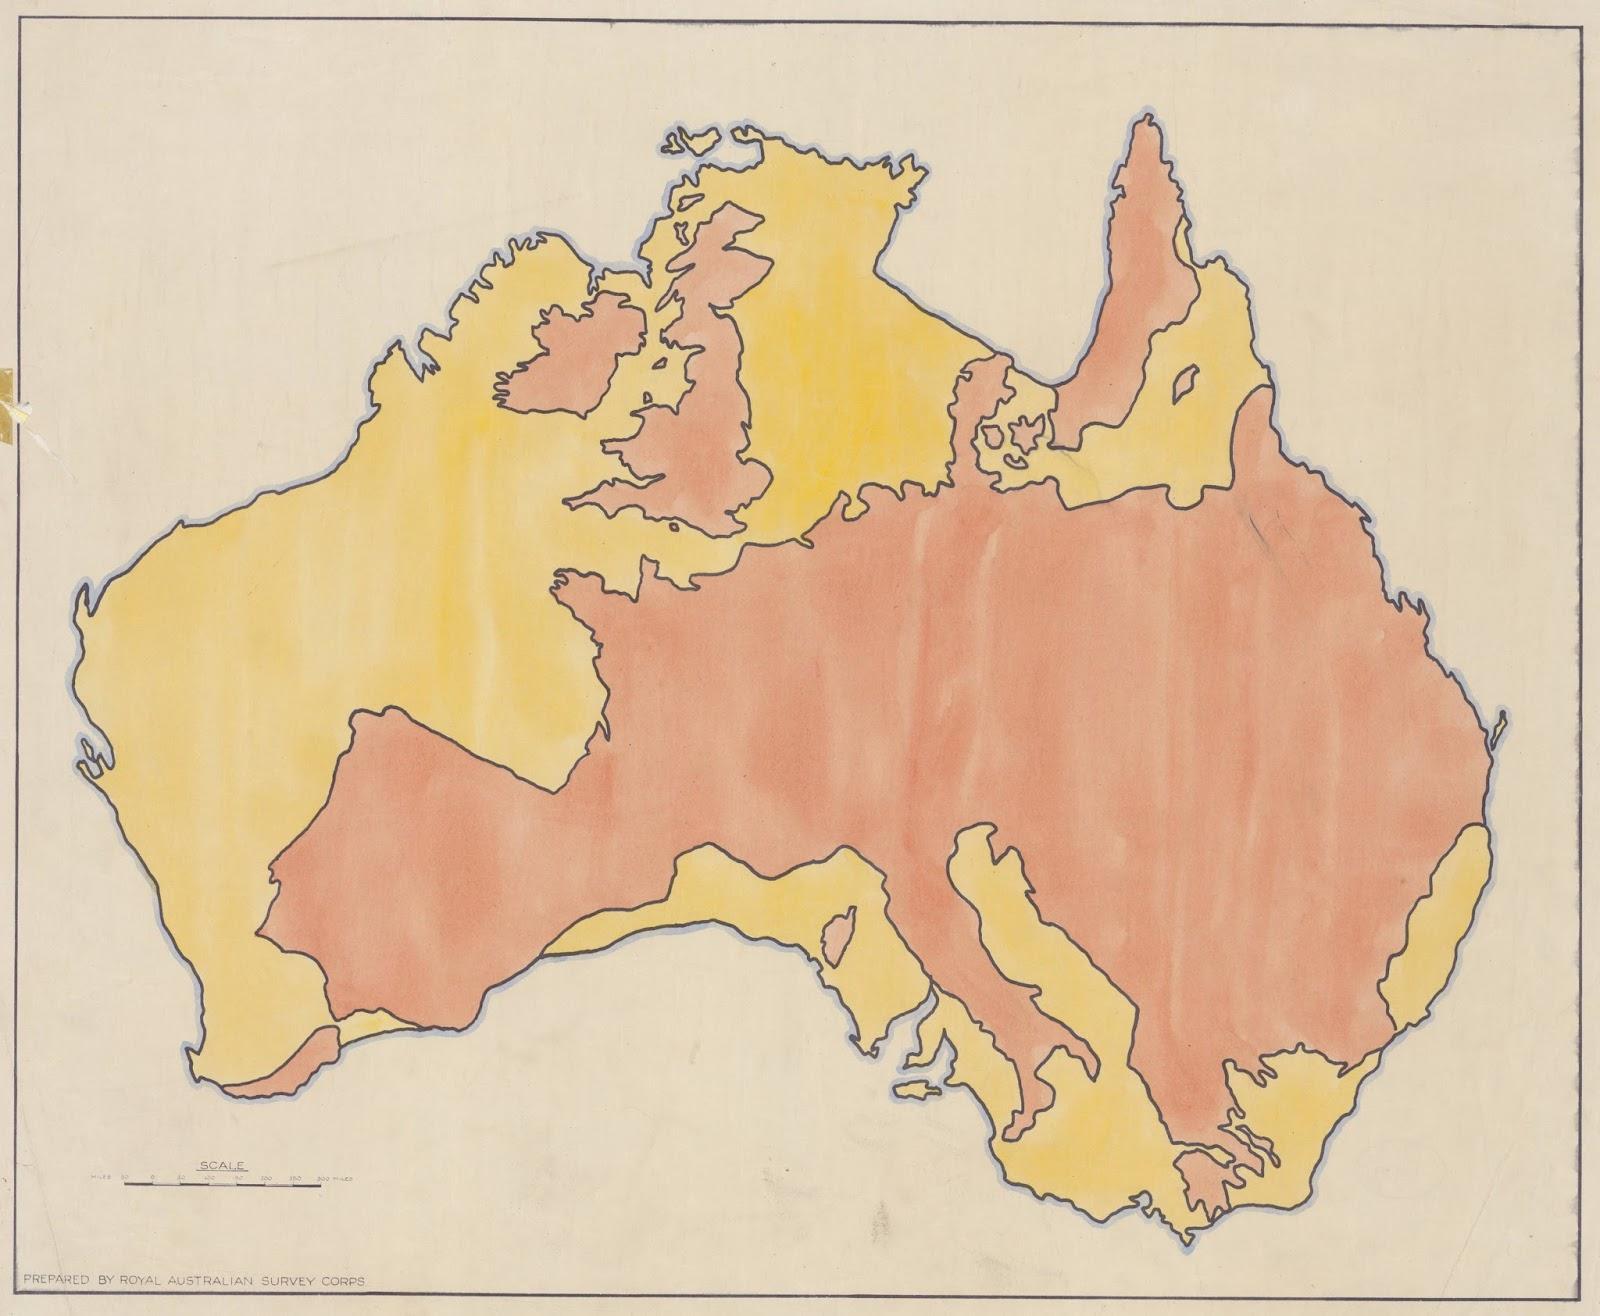 Australia and Europe comparative map